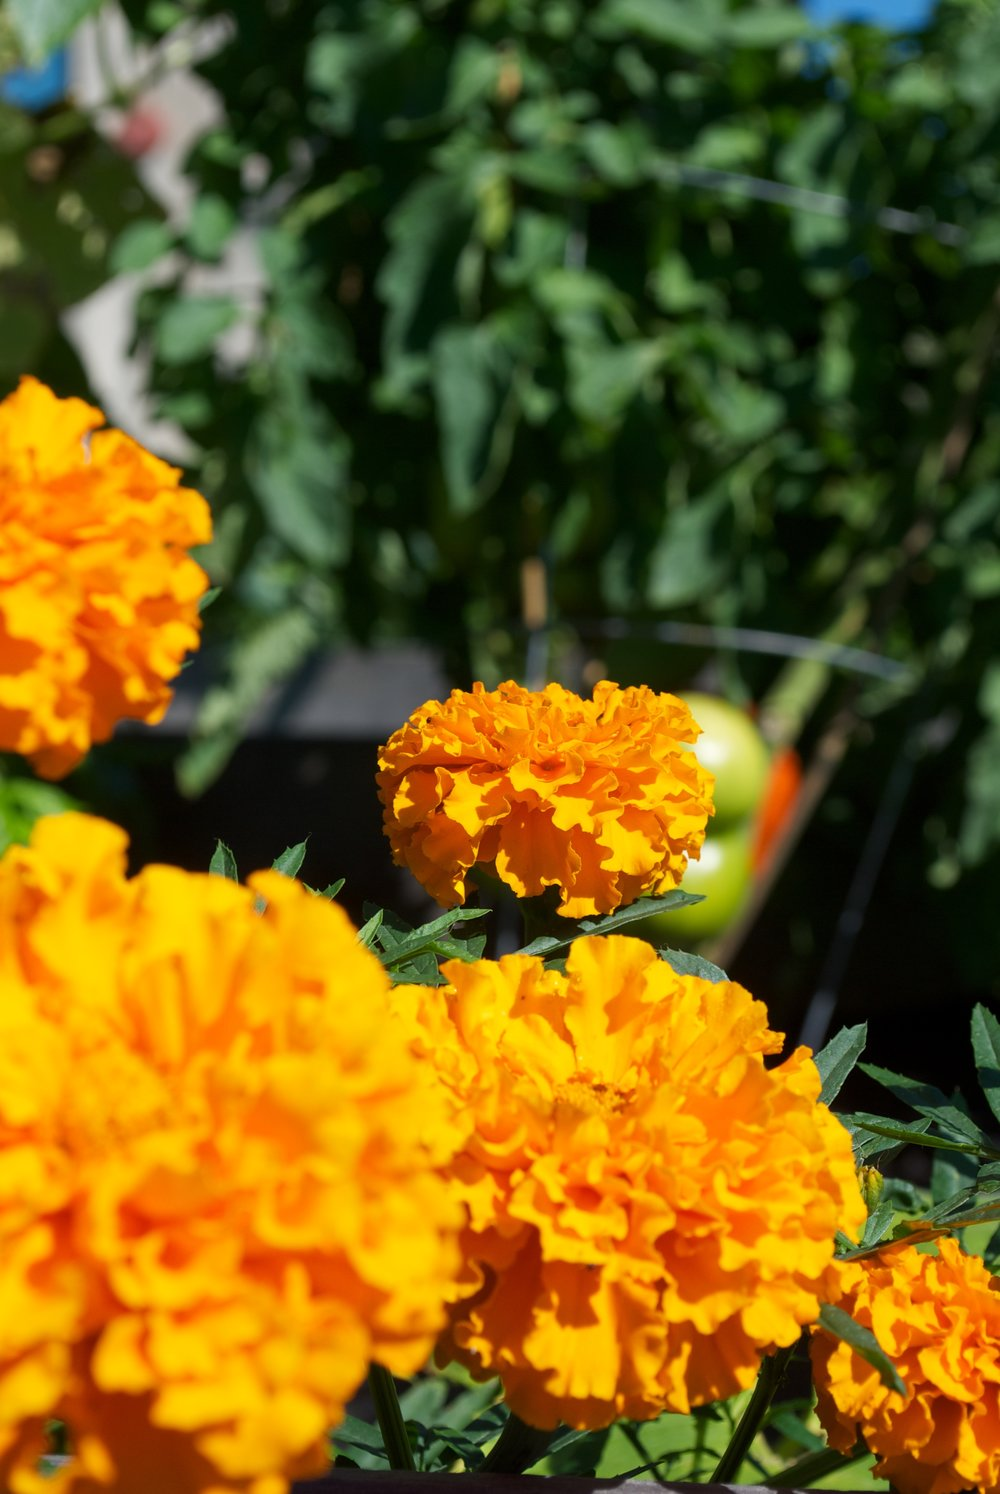 Marigolds + Tomatoes